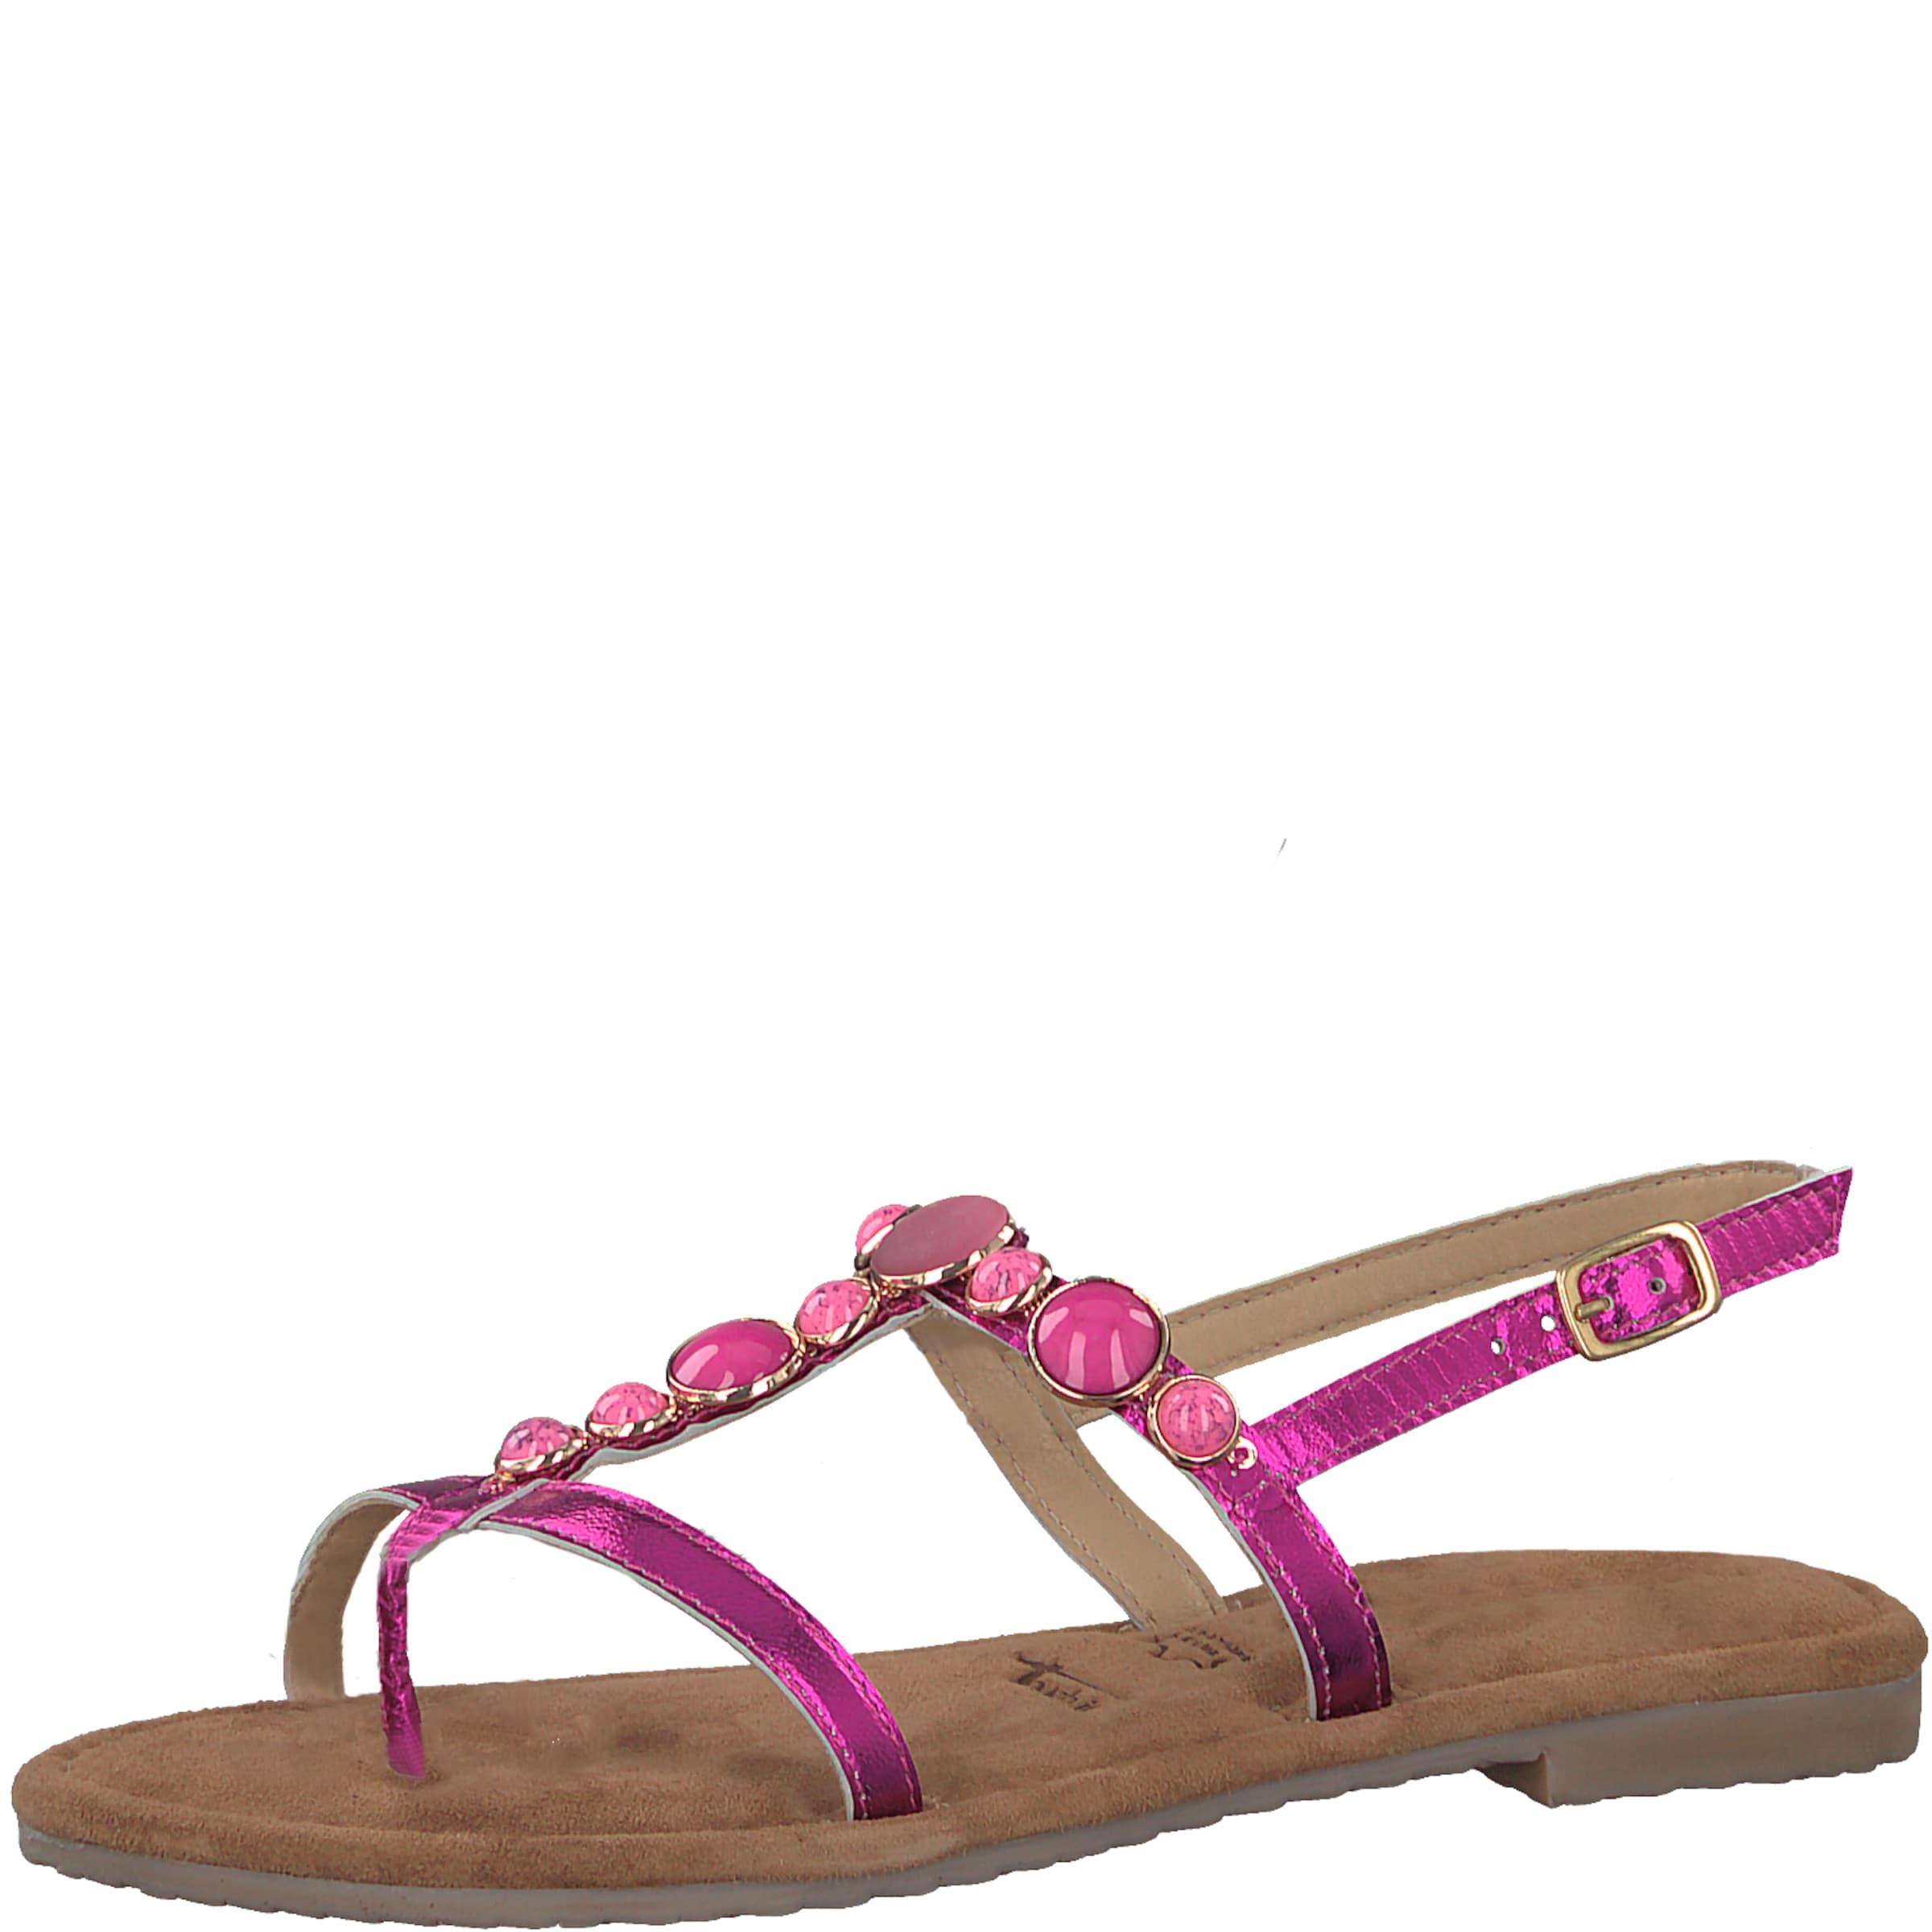 Haltbare Mode billige Schuhe TAMARIS | Sandale Sandale | Schuhe Gut getragene Schuhe 19efdf